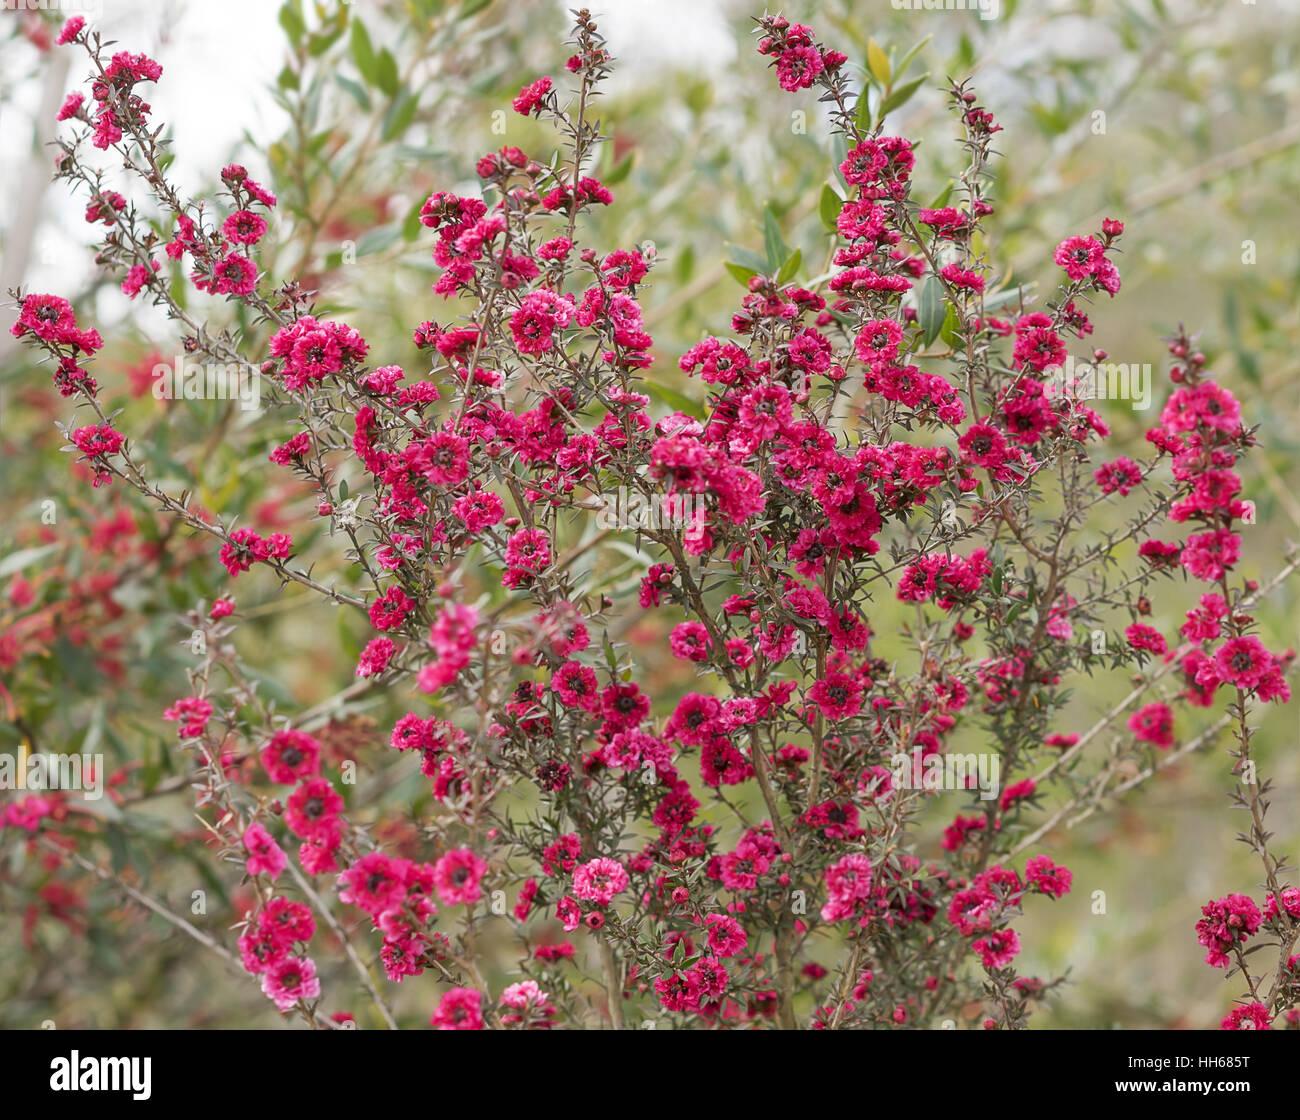 Australian Leptospermum scoparium Burgundy Queen with  profuse small double burgundy pink flowers - Stock Image